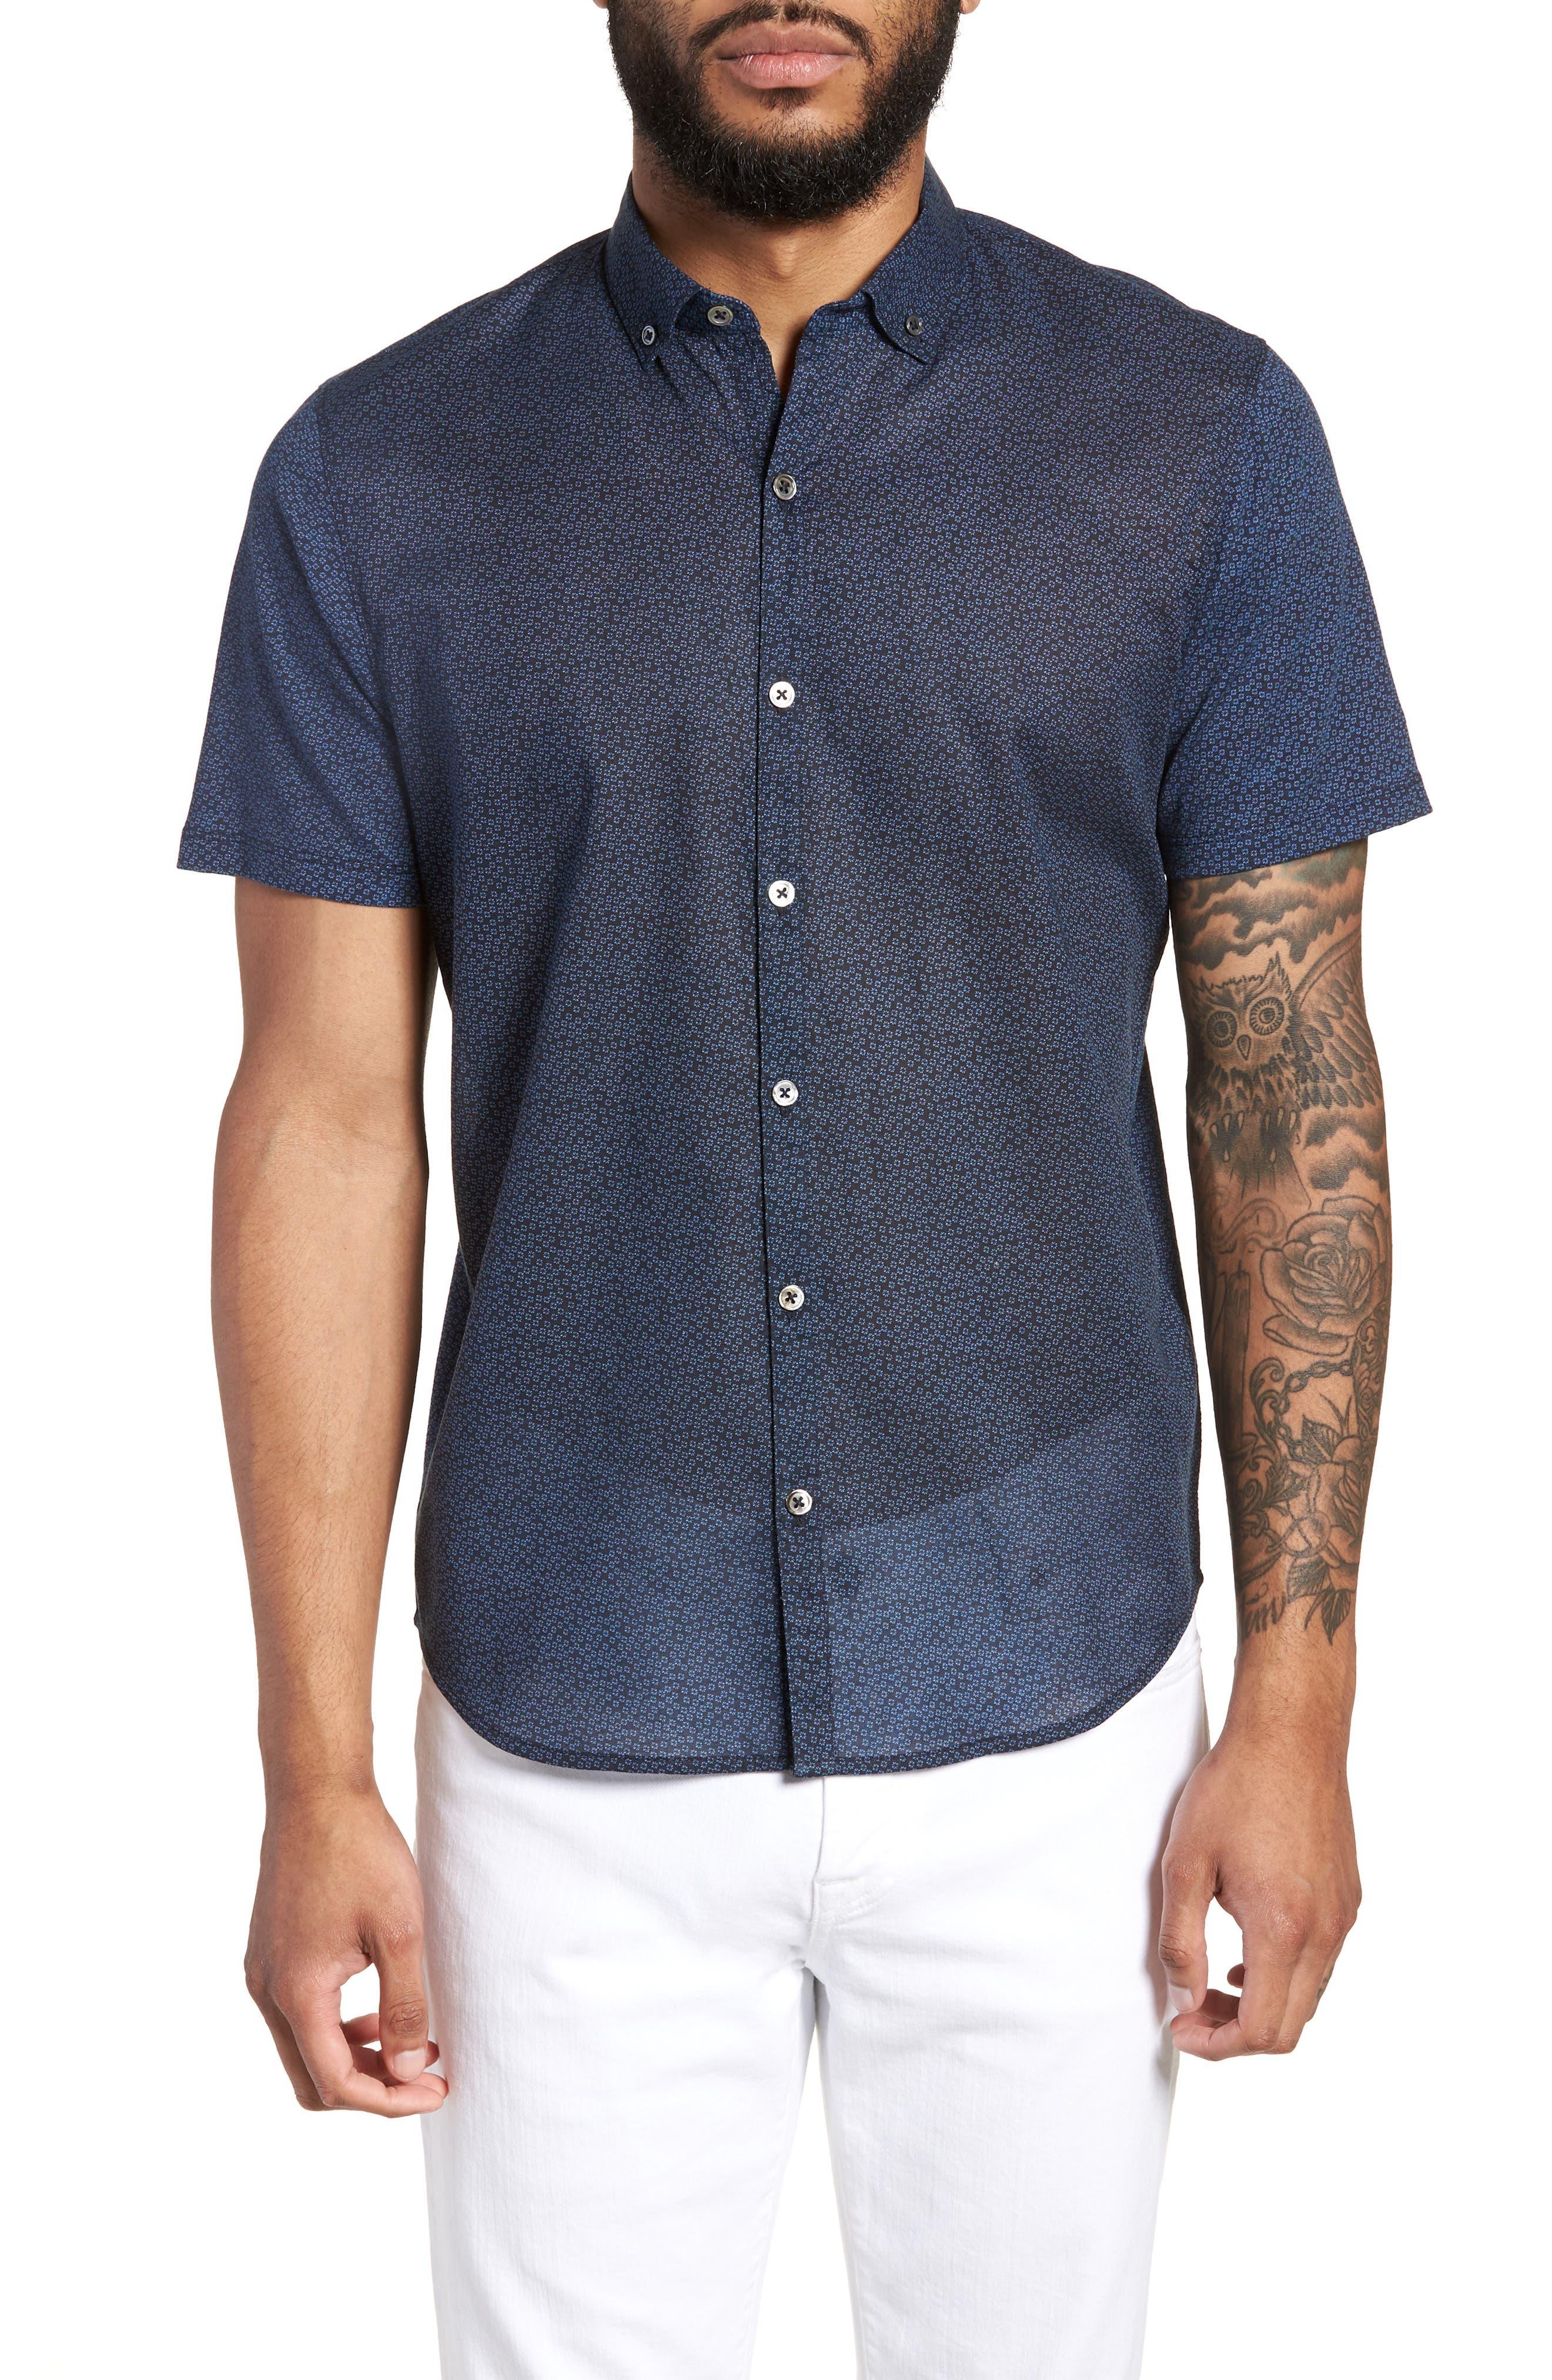 Clyde Slim Fit Sport Shirt,                             Main thumbnail 1, color,                             410